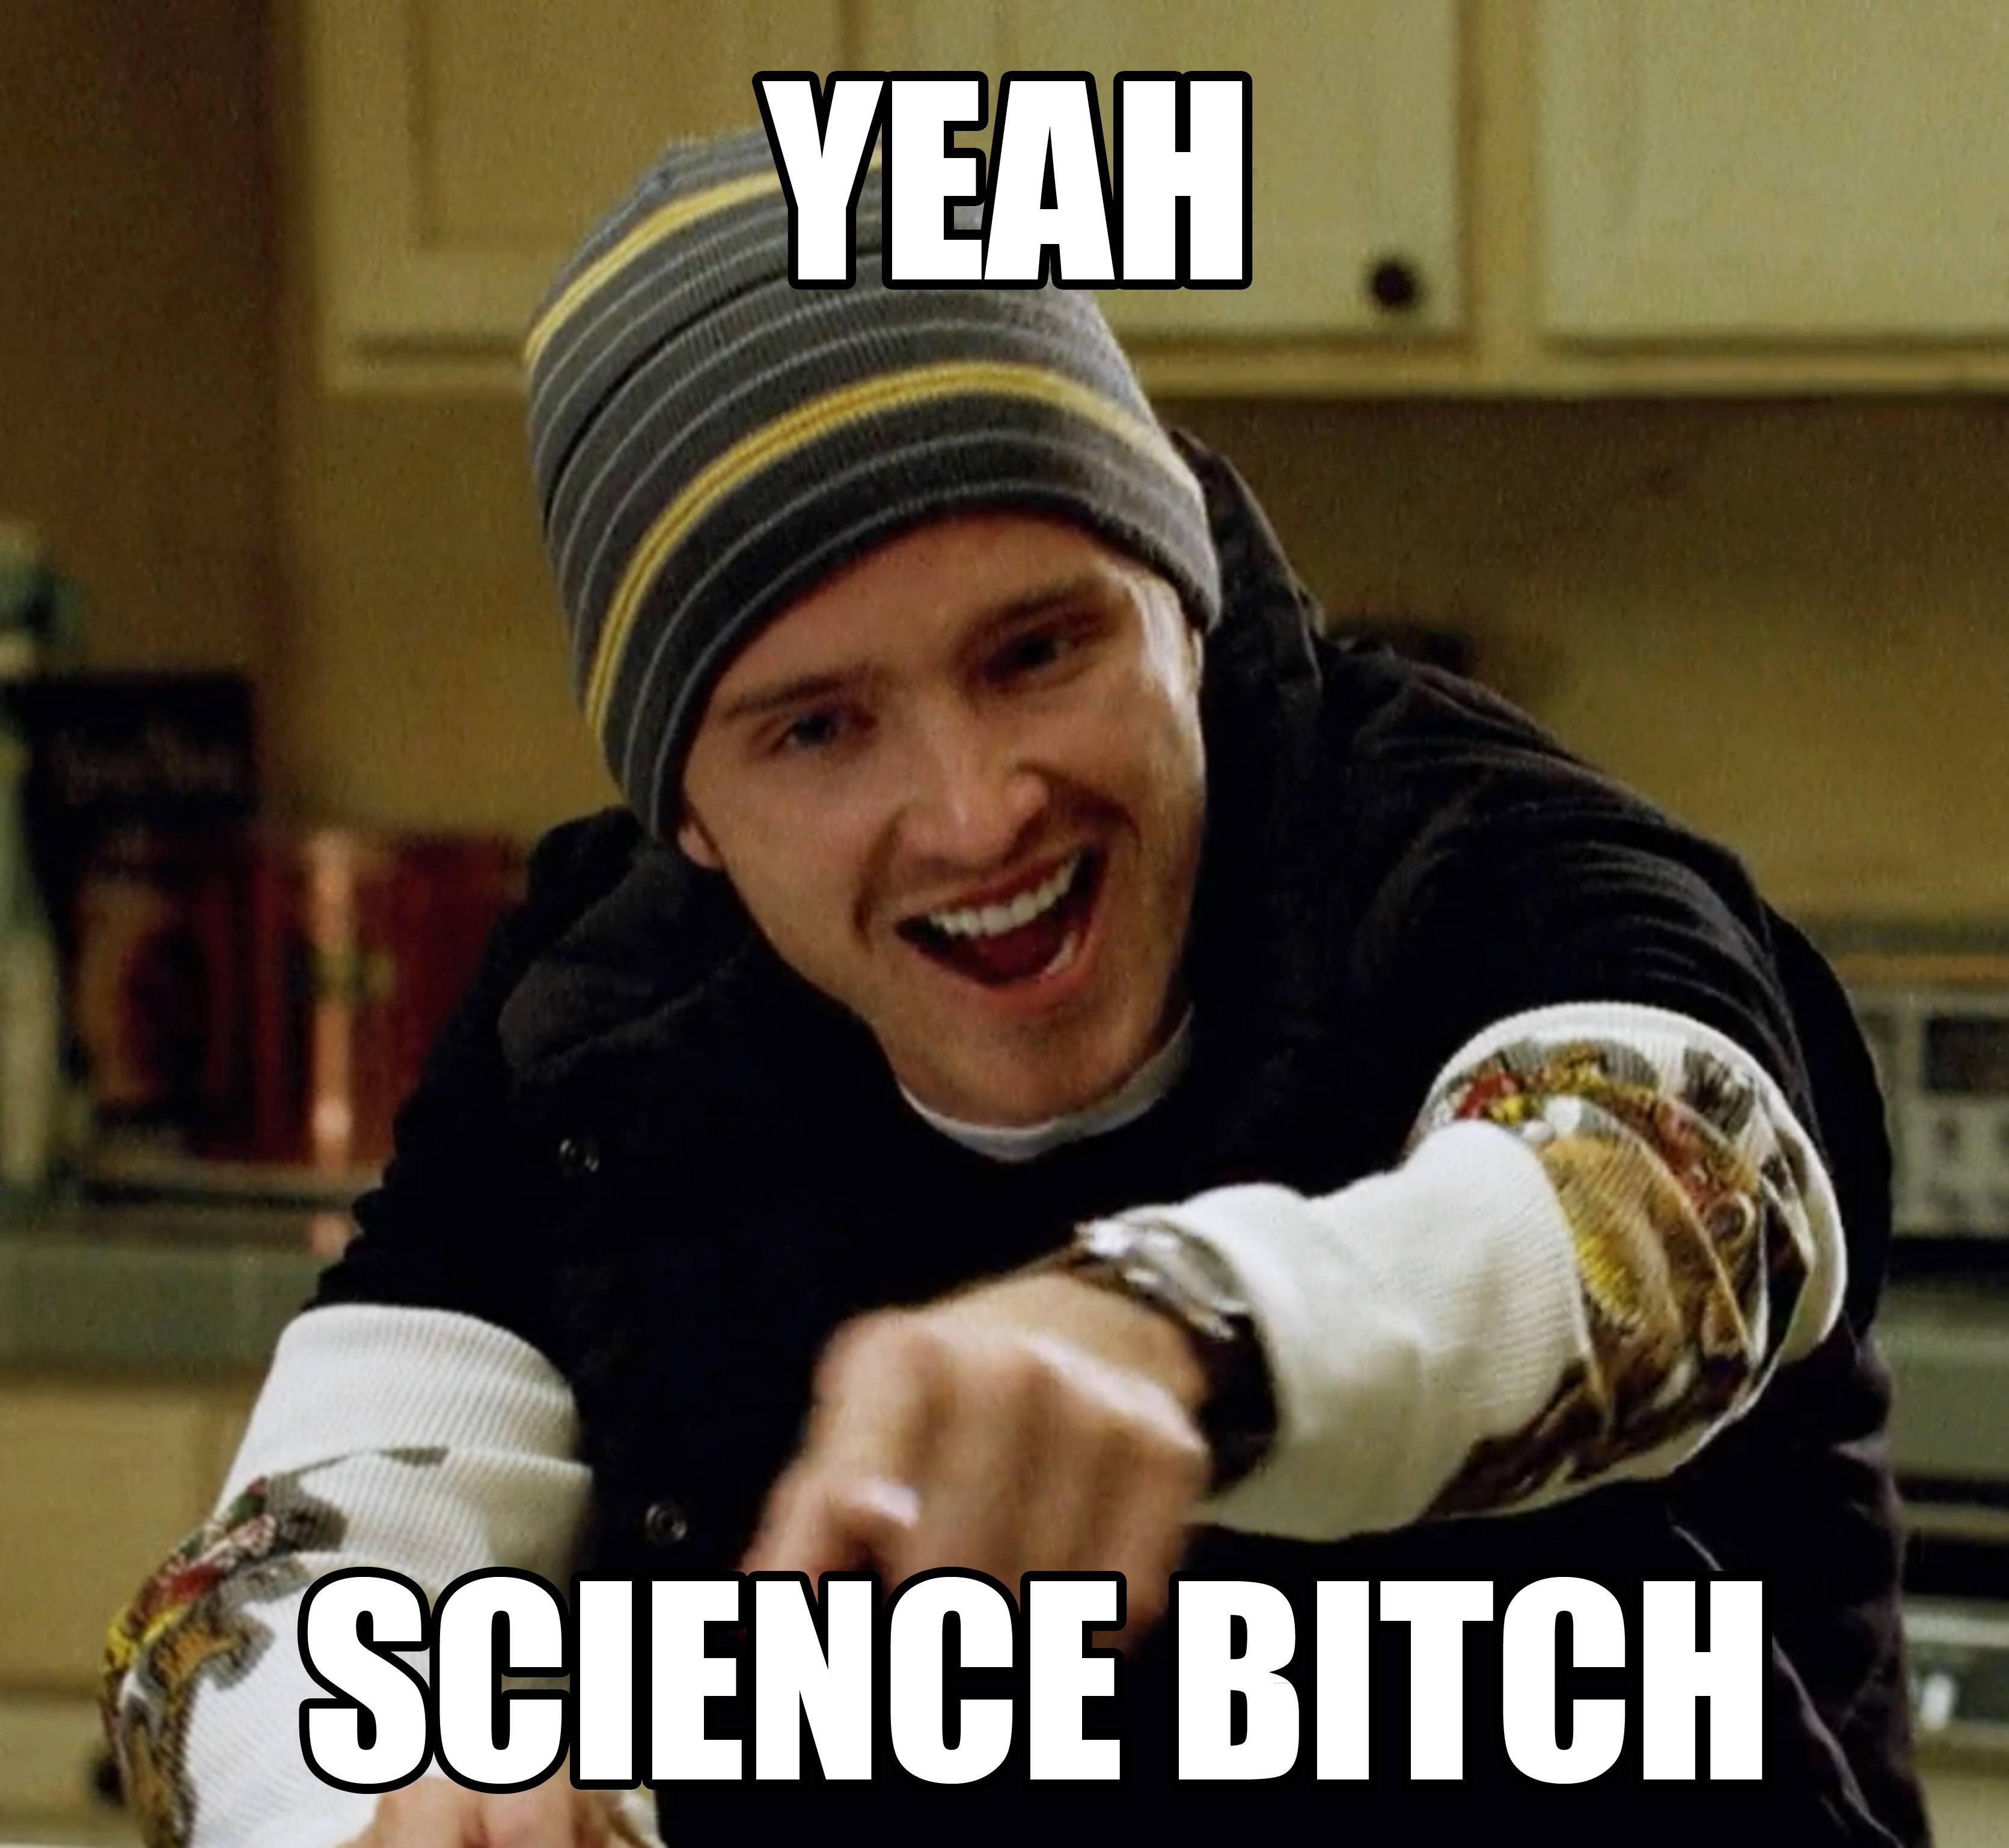 yeah science bitch meme